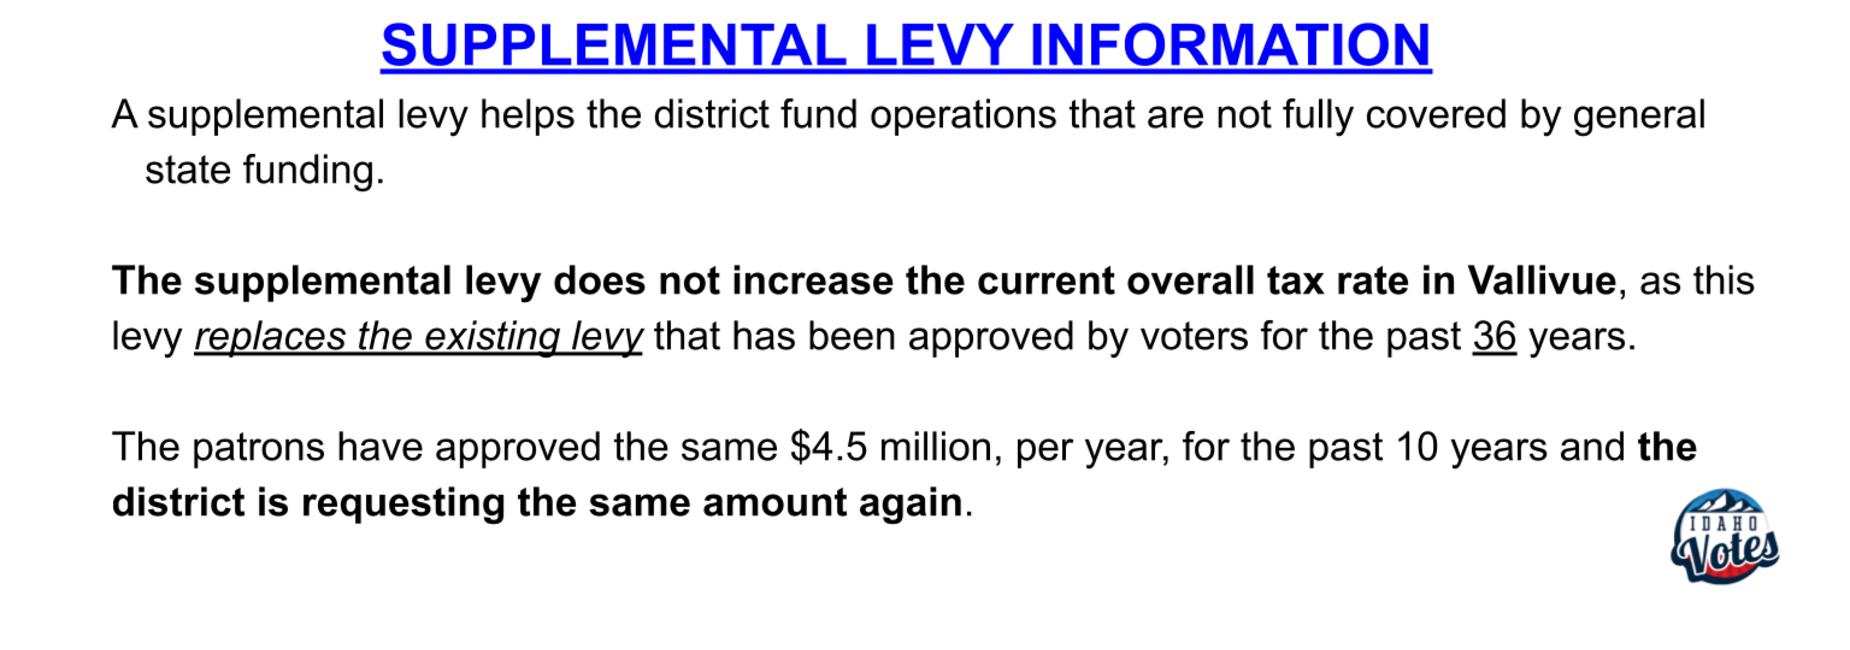 Supplemental Levy Information